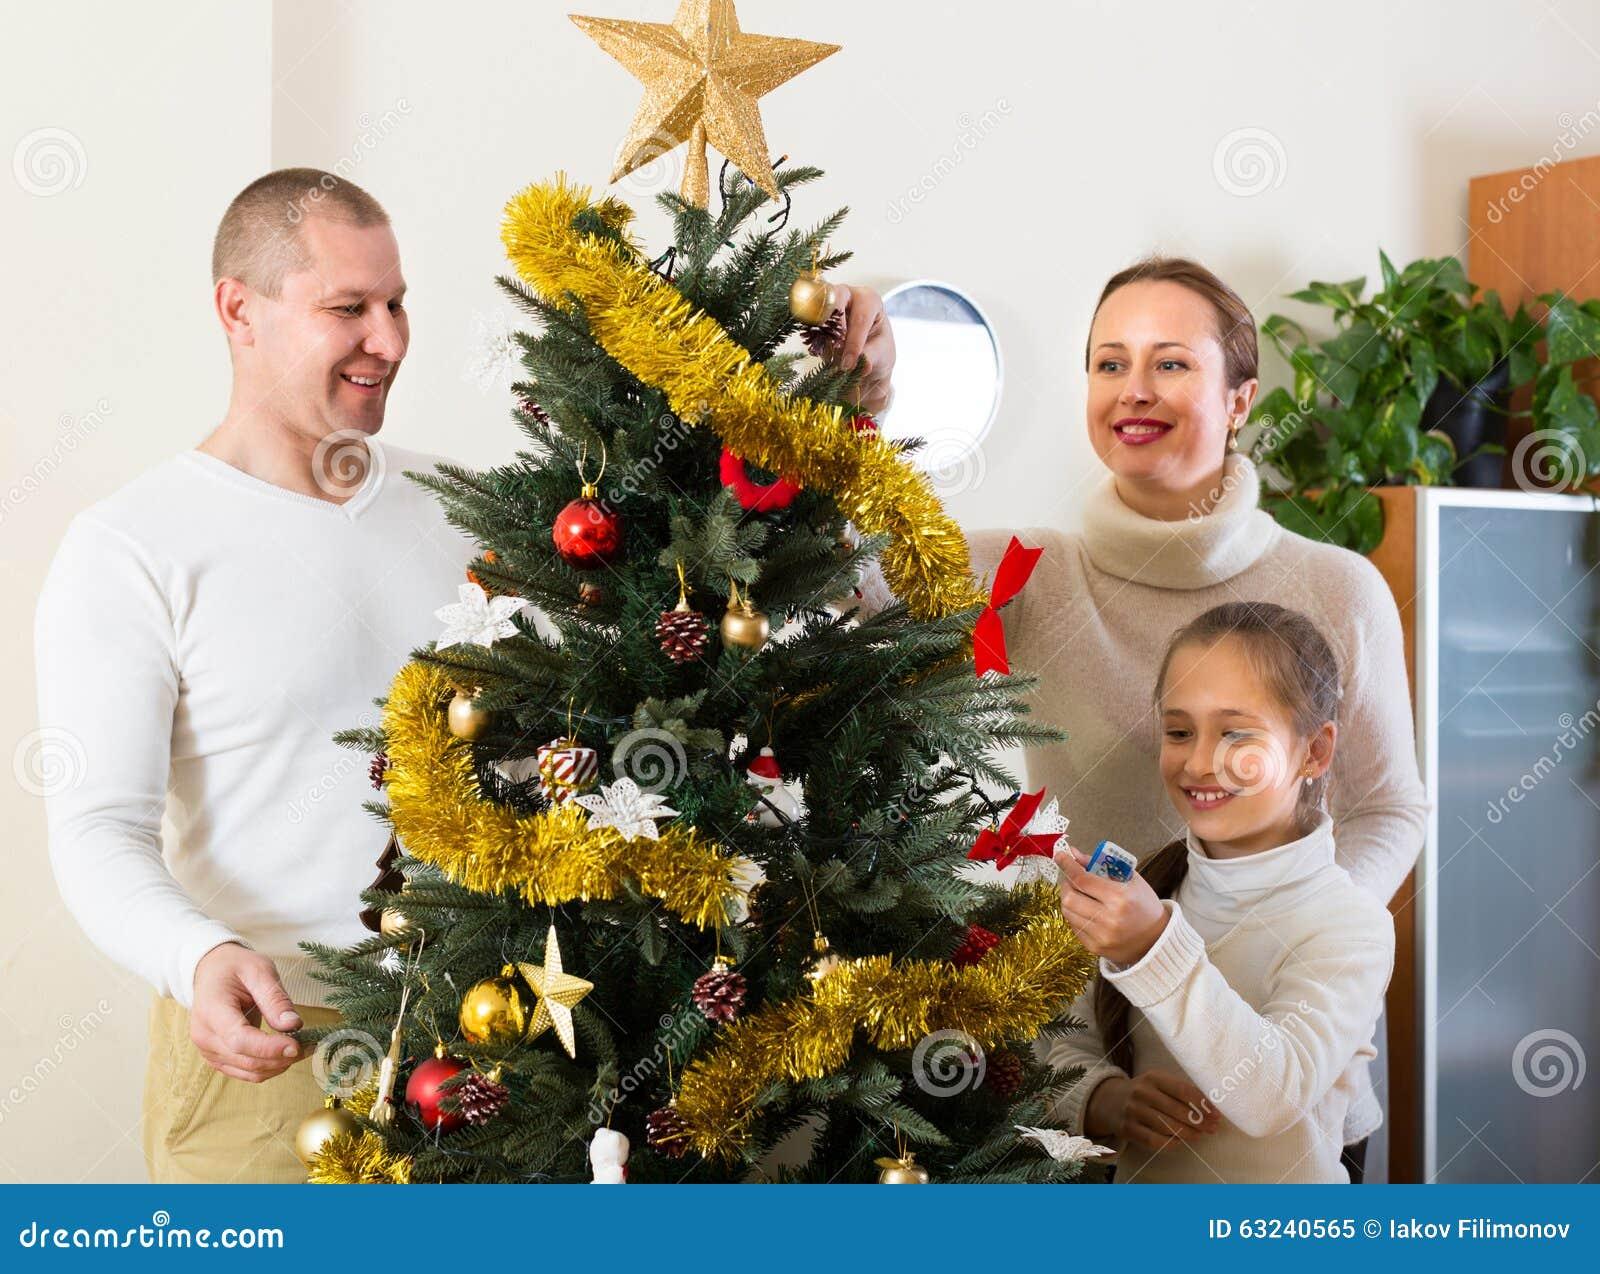 Family Decorating Christmas Tree Stock Photo Image 63240565